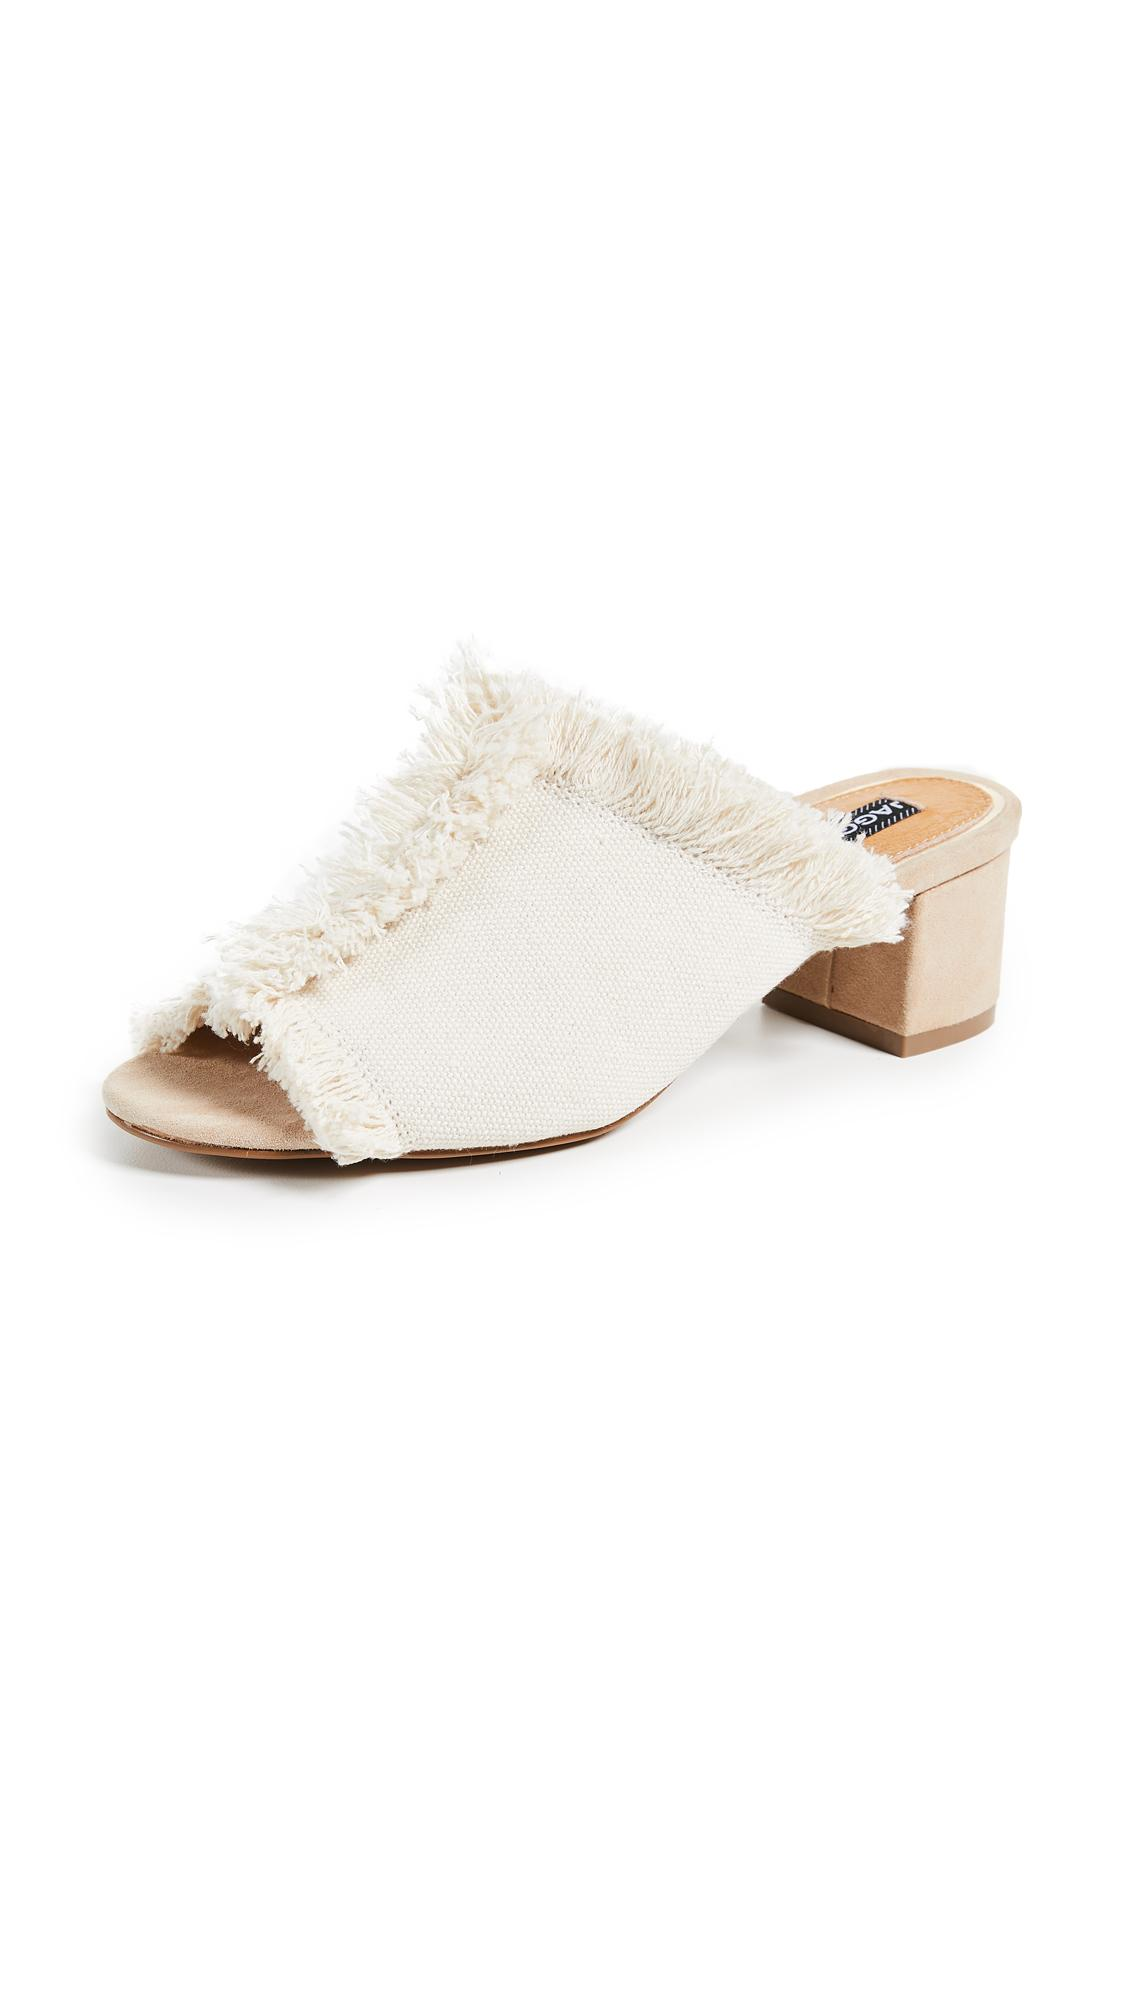 Jaggar Resolve Block Heel Sandals In Oatmeal